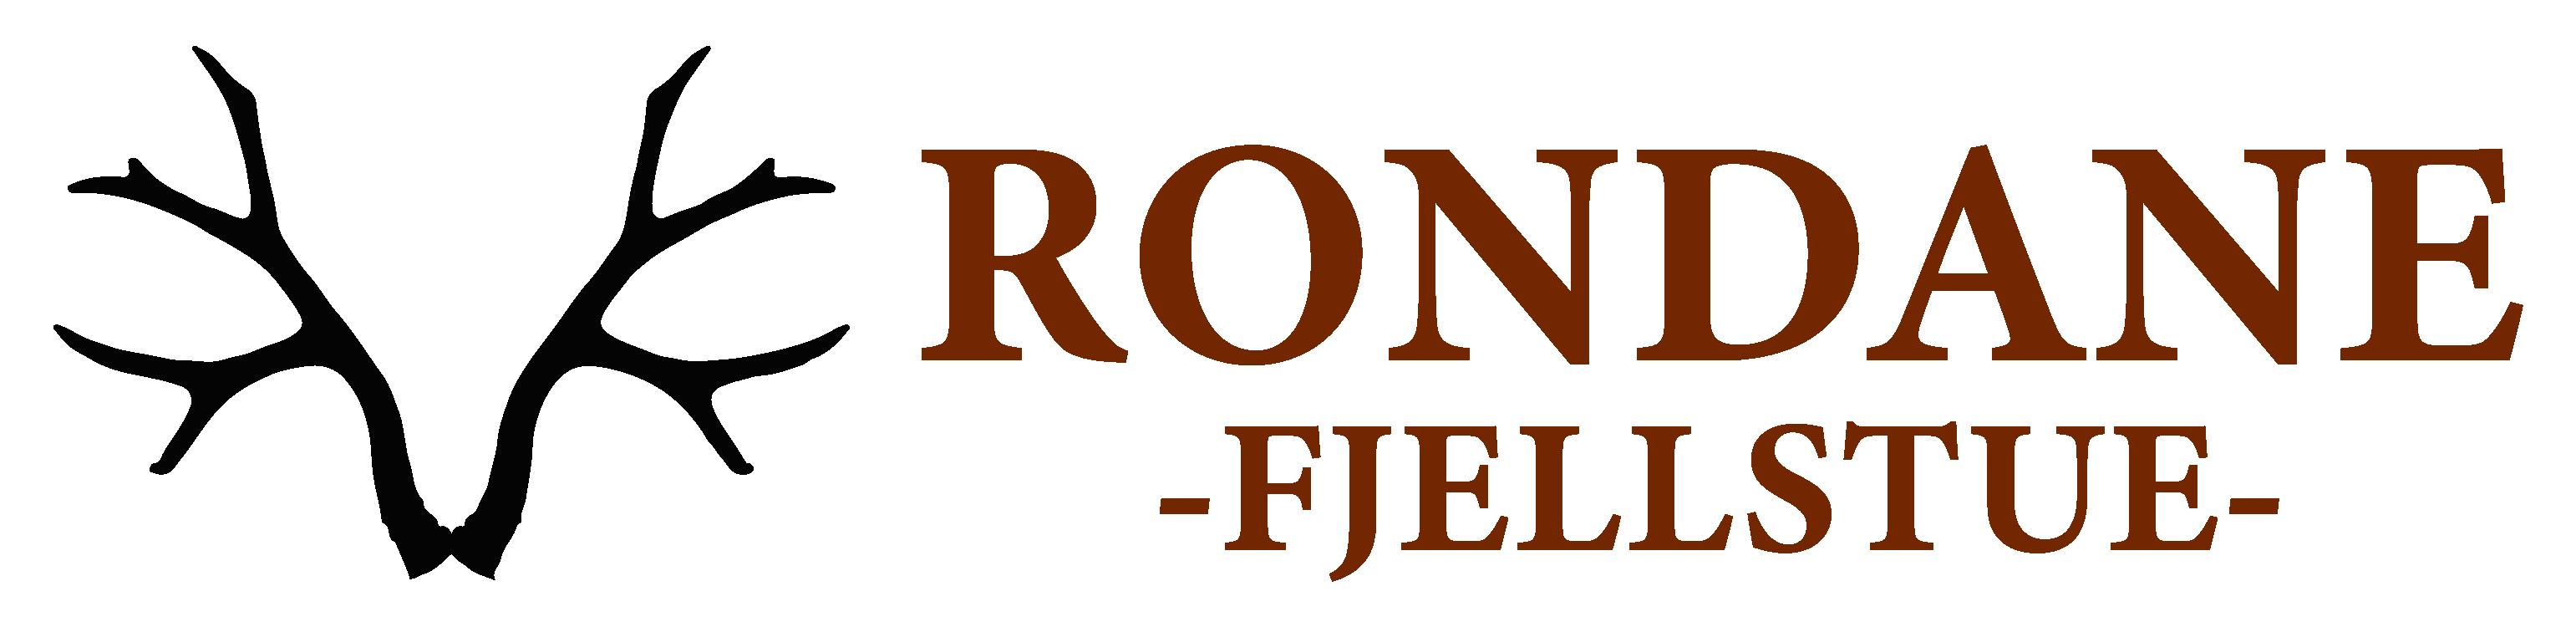 Rondane Fjellstue